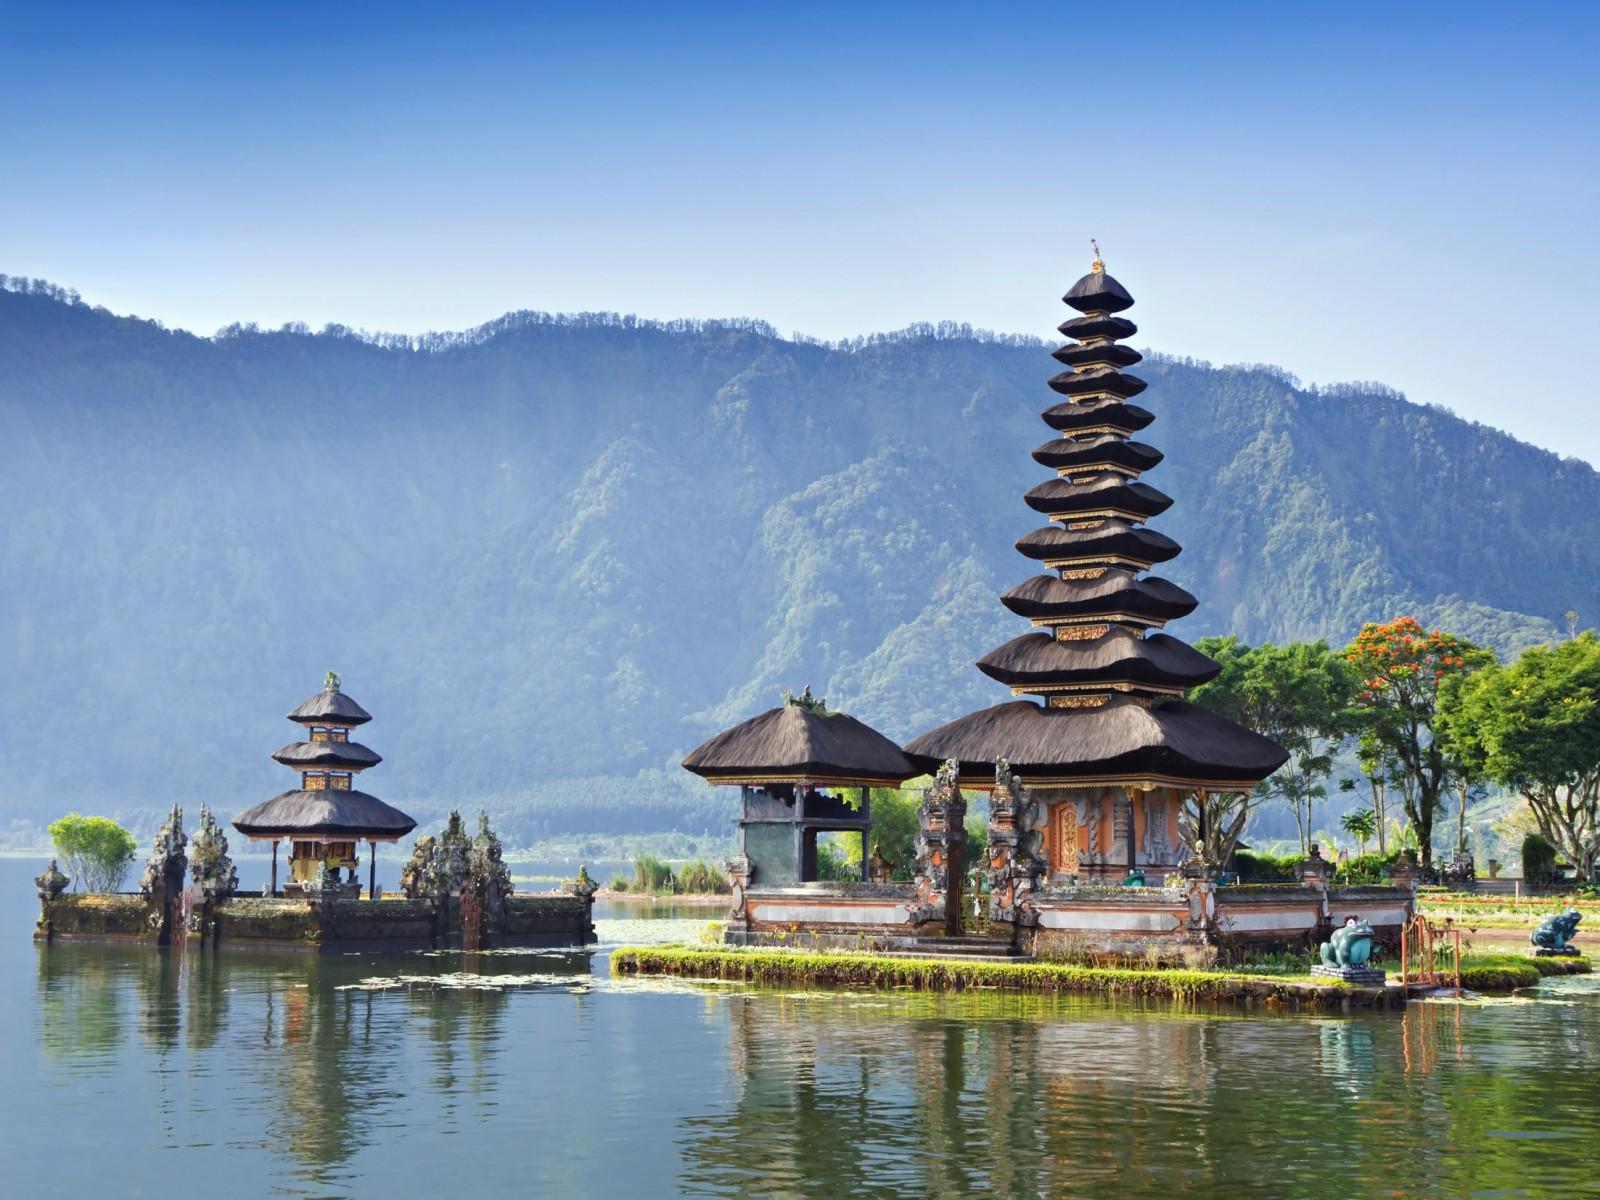 Bali Bali-Temple-1600x1200